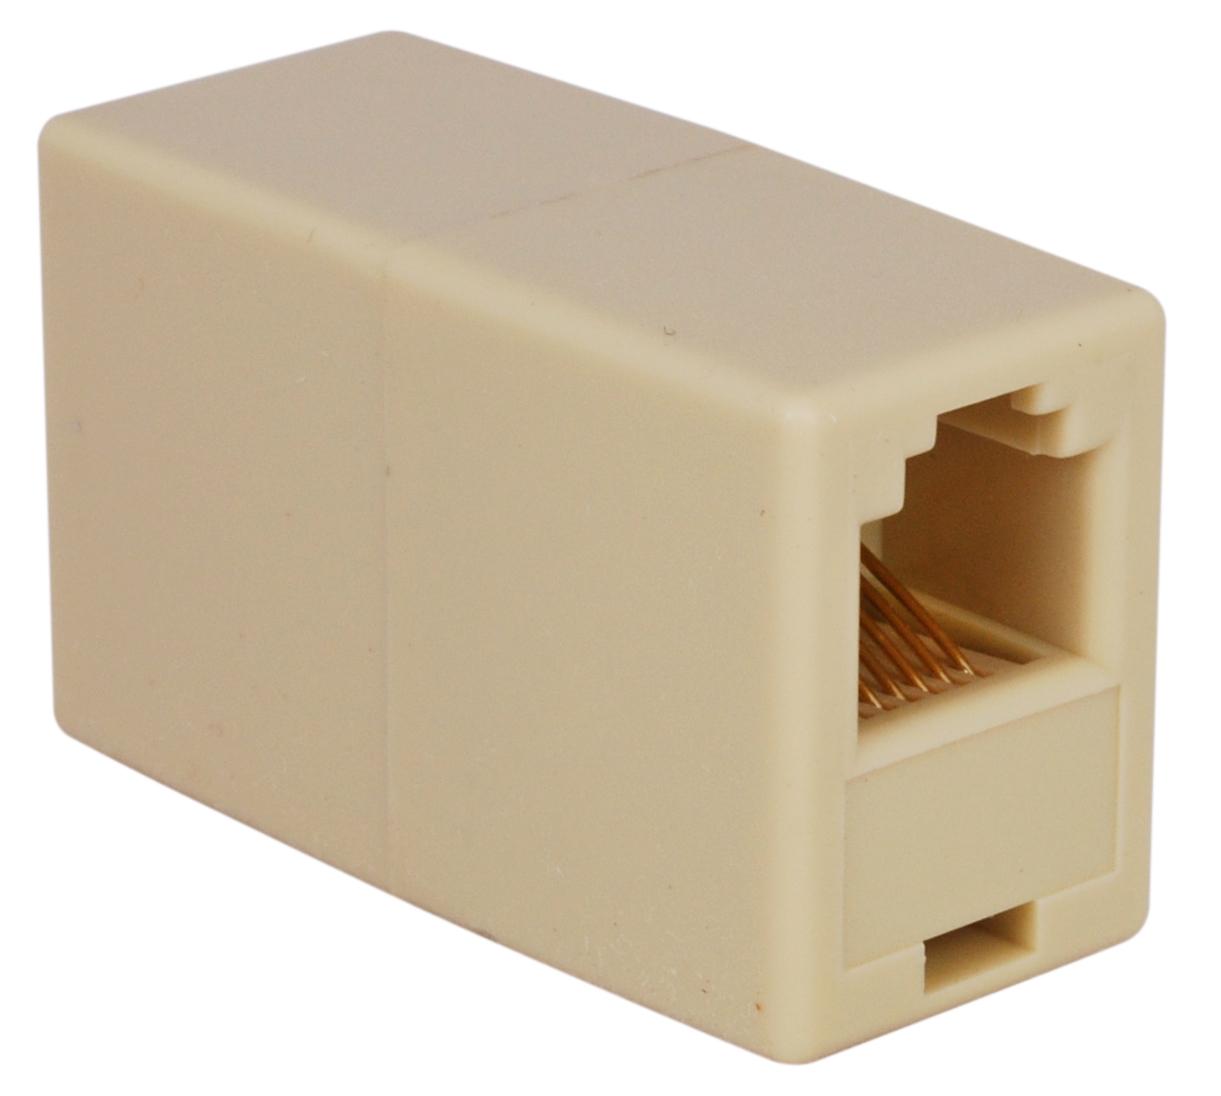 Для печей: Соединительная муфта SAWO INN-COP RJ12 муфта соединительная для трубы 16 мм 10шт tdm